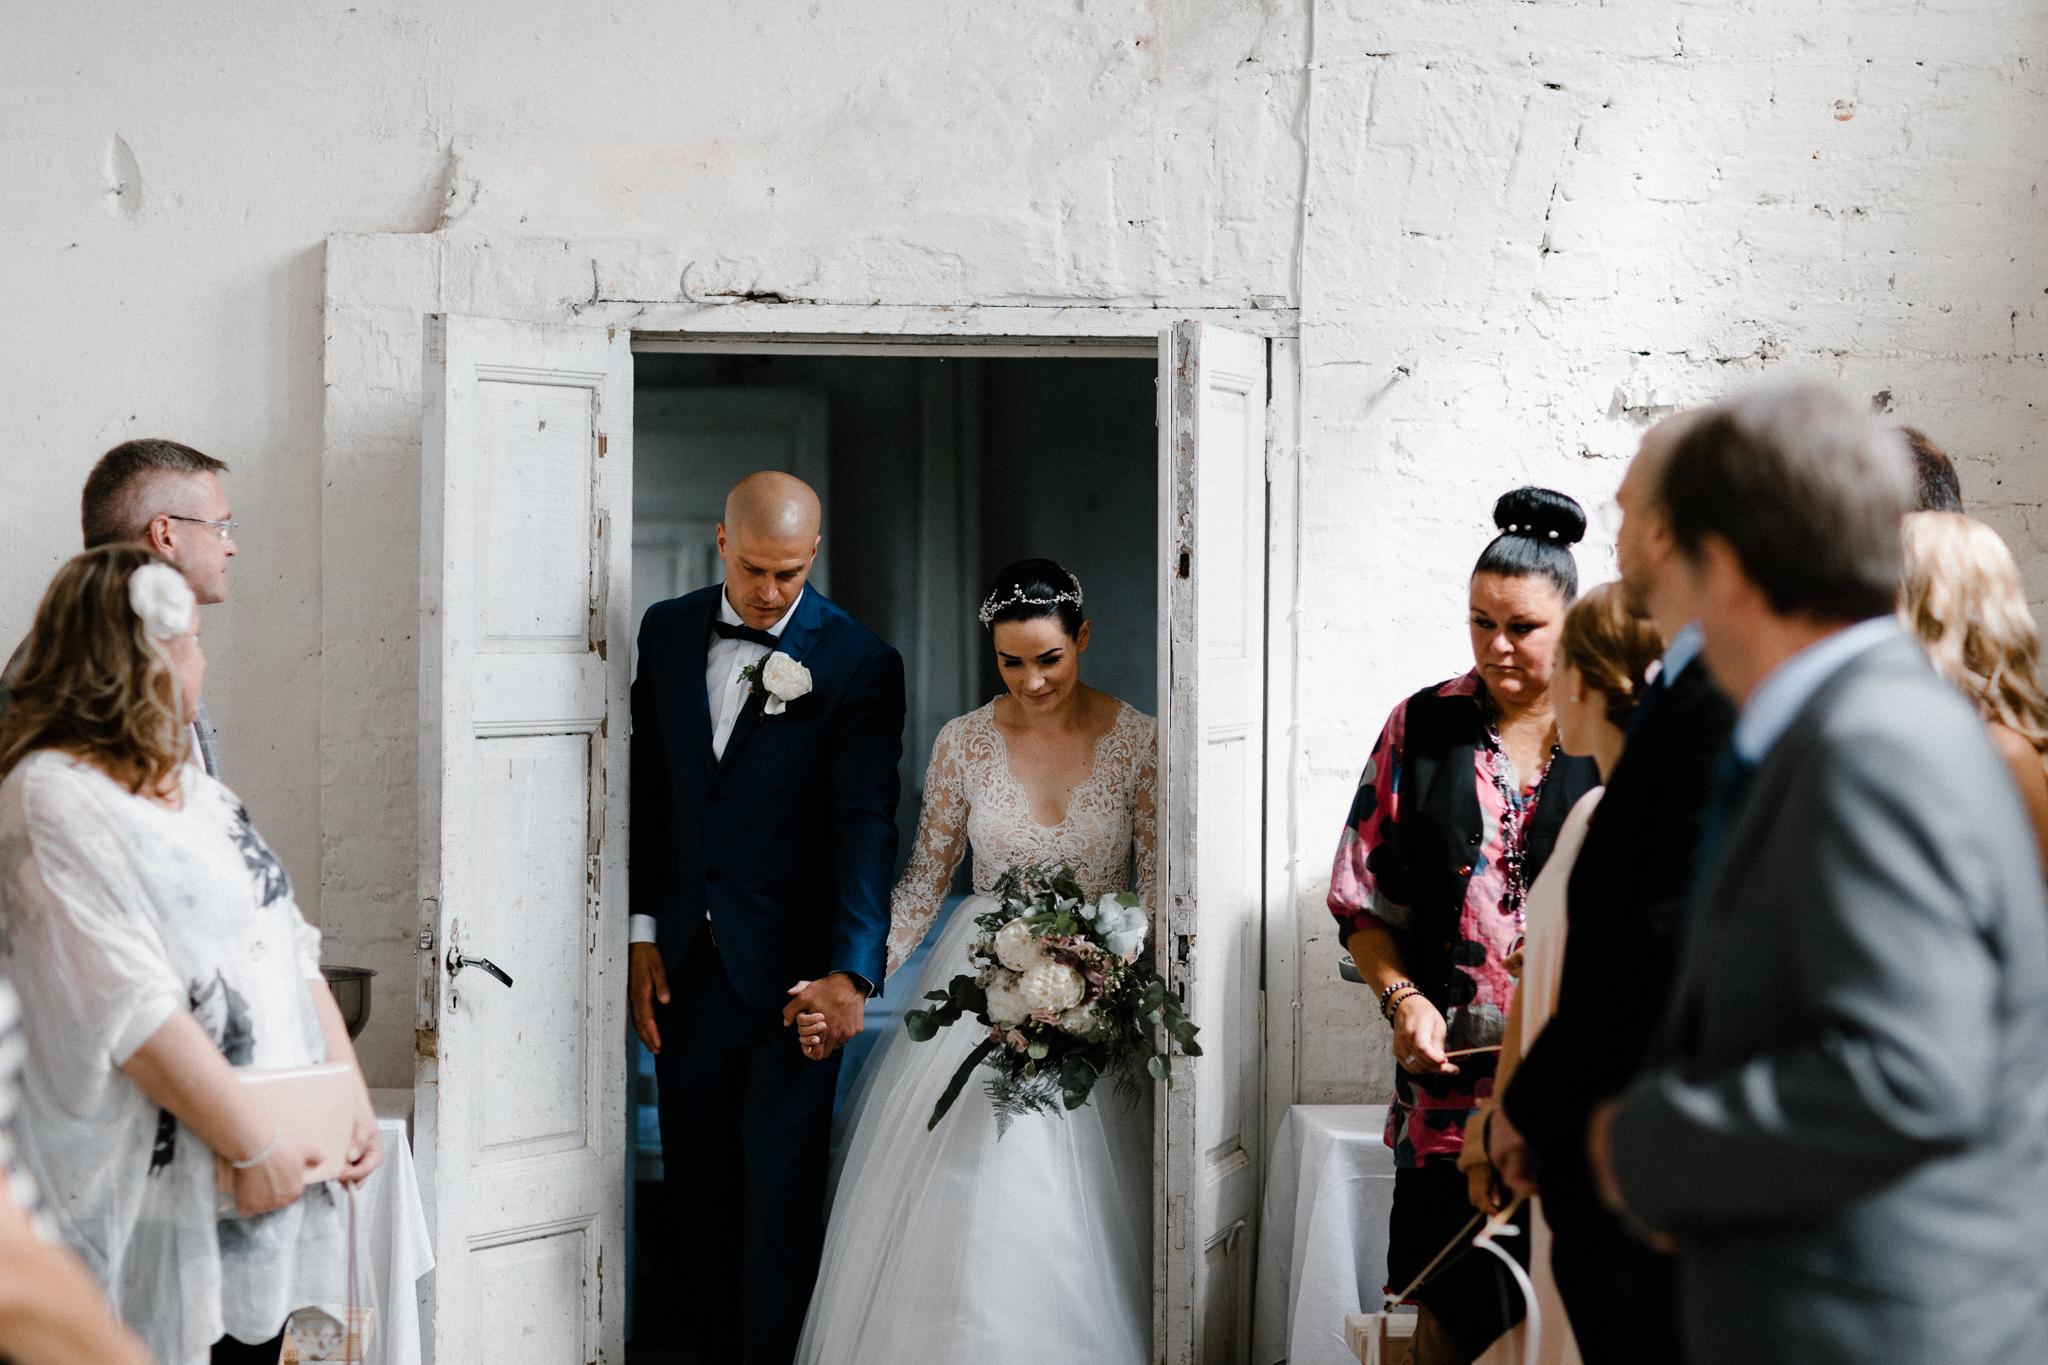 Essi + Ville   Oitbacka Gården   by Patrick Karkkolainen Wedding Photography-146.jpg